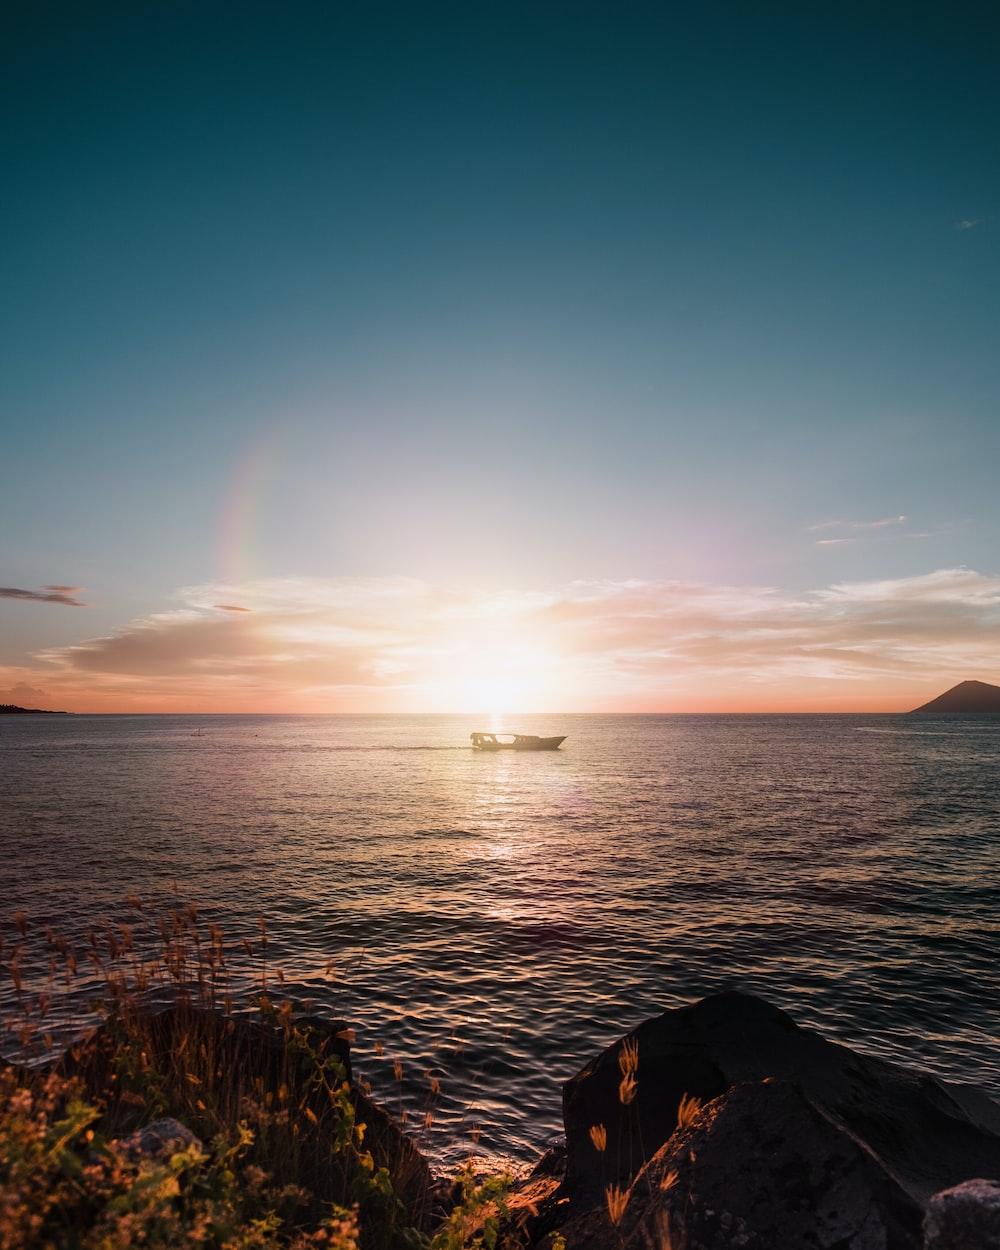 boat on sea near mountain